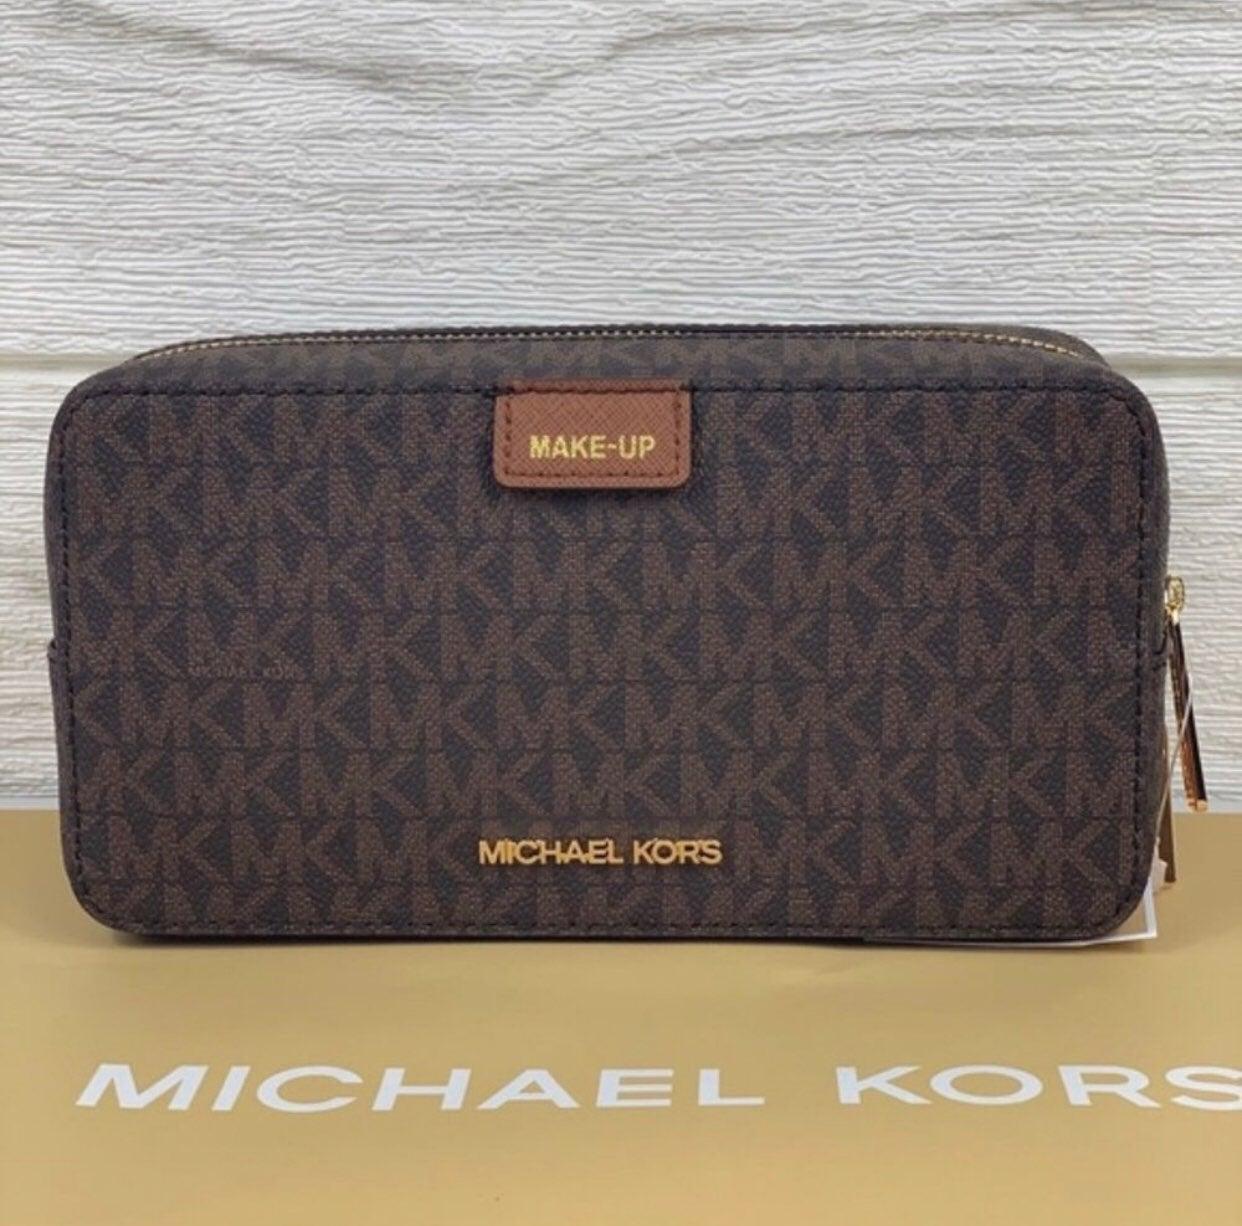 MICHAELKORS Travel MakeUp Pouch Case Bag